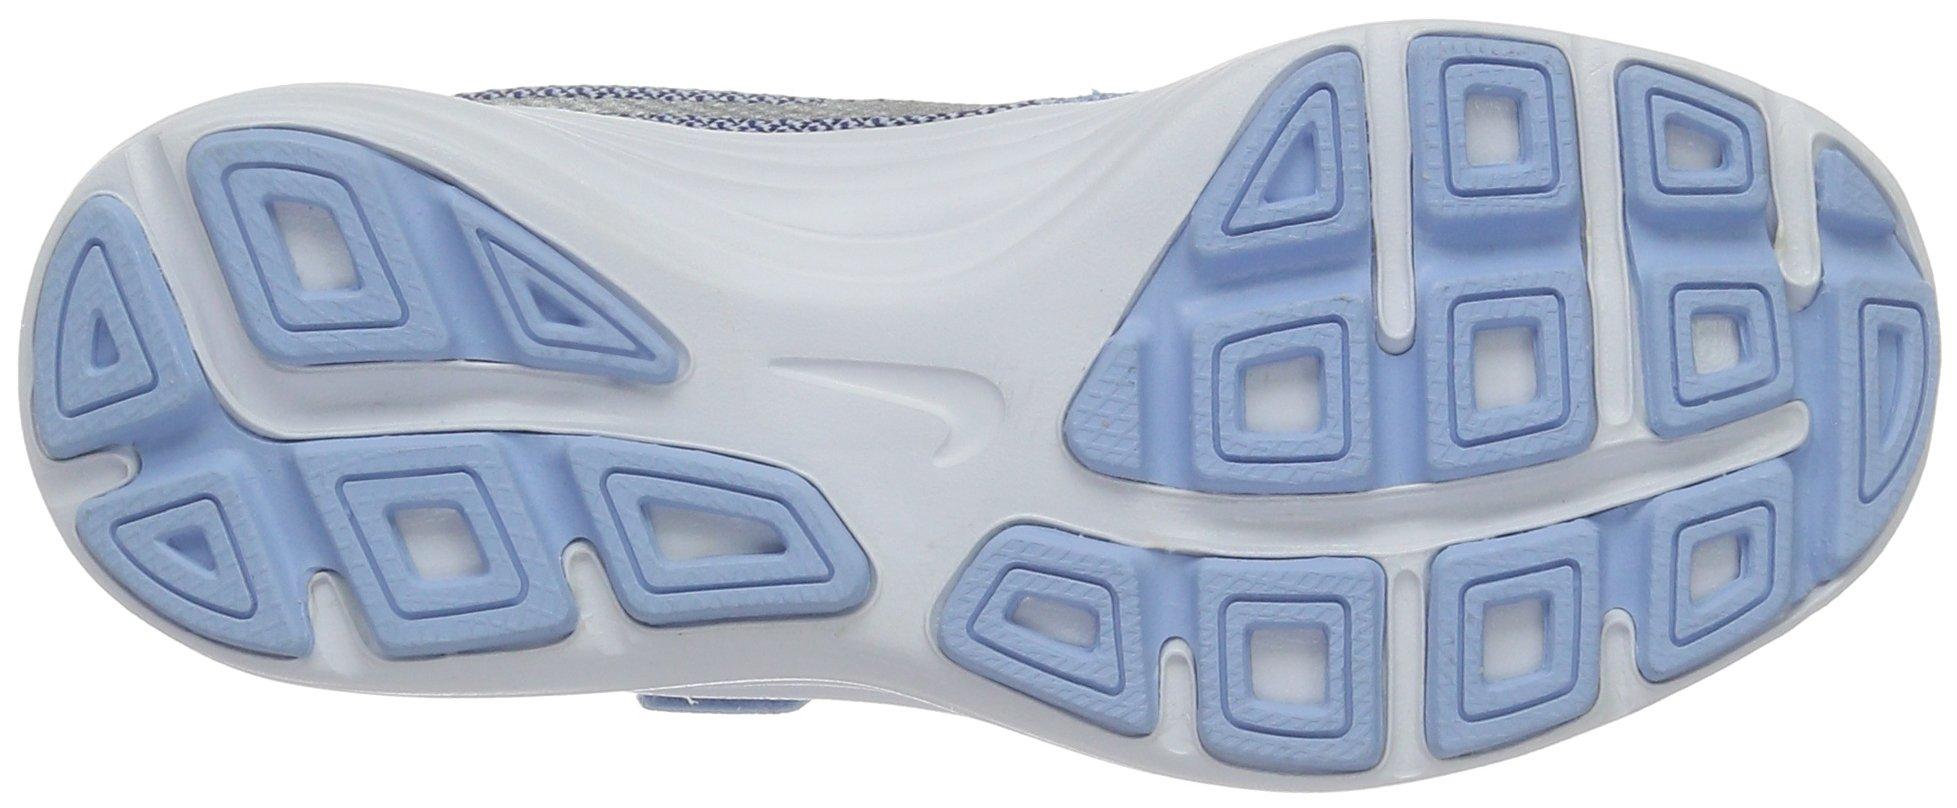 NIKE Kids' Revolution 3 (Psv) Running-Shoes, Bluecap/Metallic Silver/Deep Royal Blue, 1 M US Little Kid by Nike (Image #3)